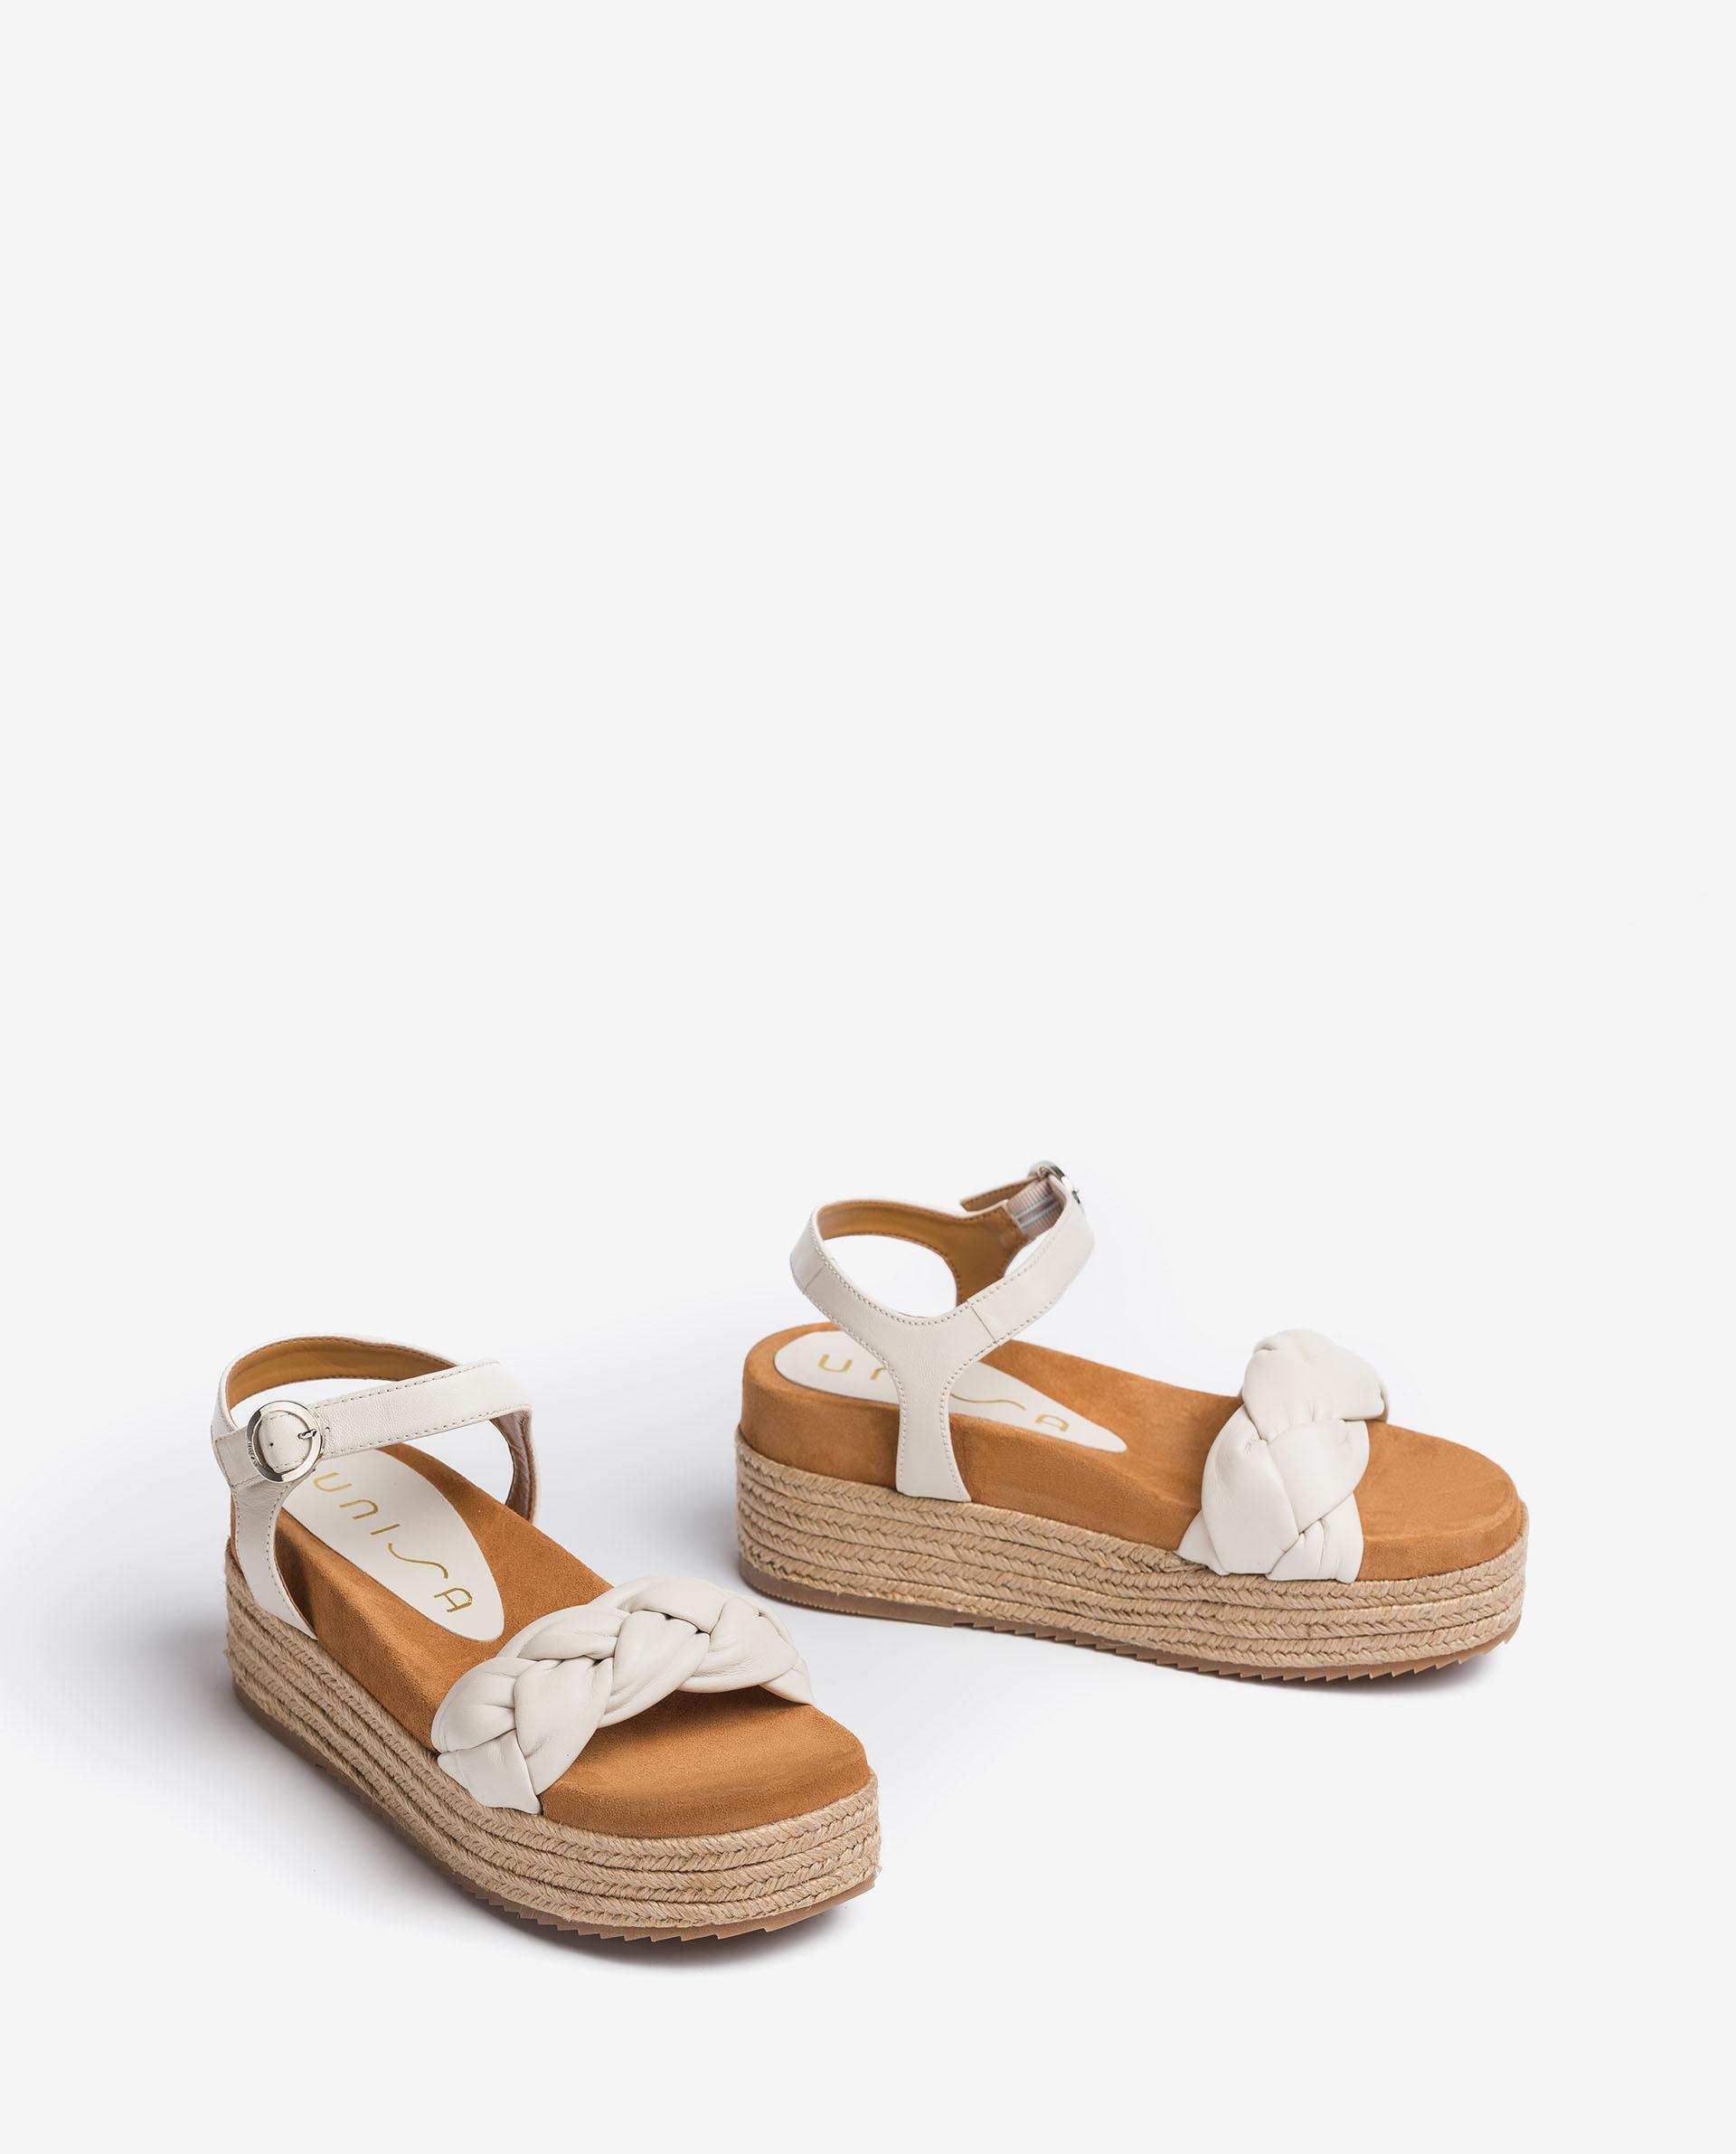 UNISA Platform padded leather sandals CLOY_NS 2